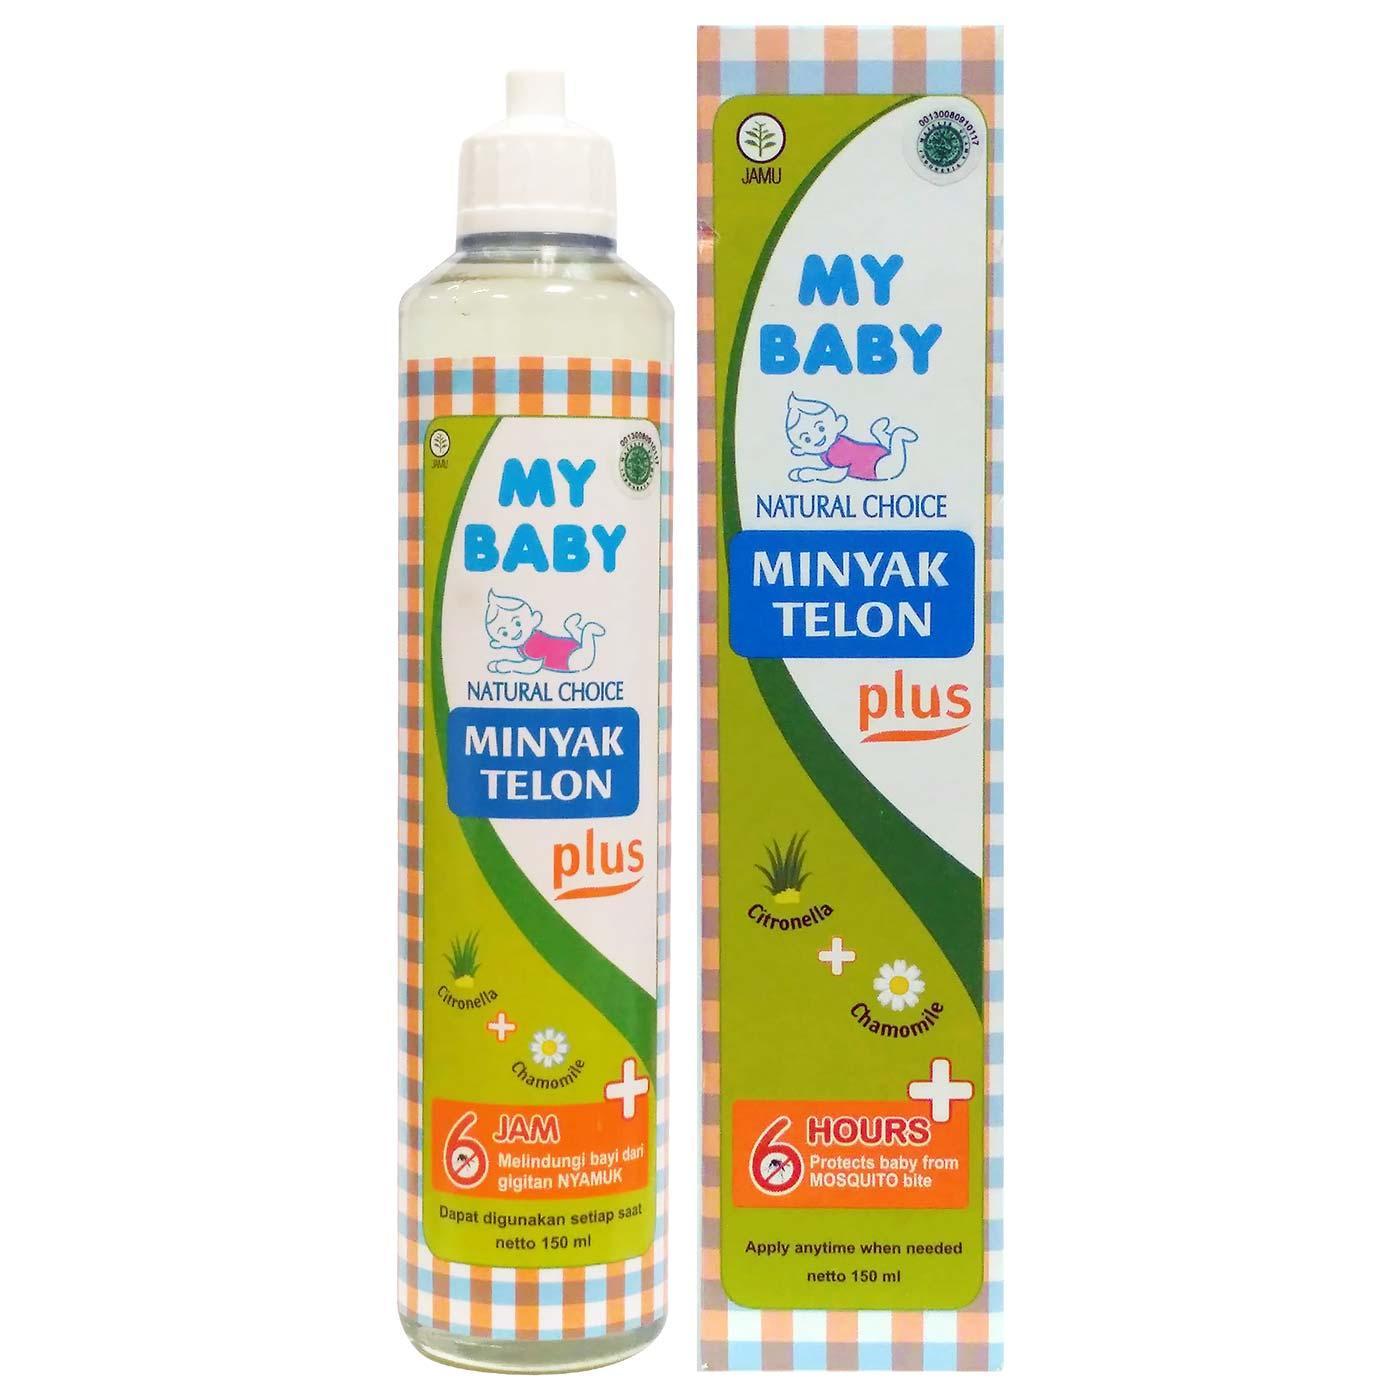 Delin Baby's - My Baby Minyak Telon Plus 150 ml 1 Botol / Perut Kembung Bayi / Minyak Urut Bayi / Obat Masuk Angin Bayi